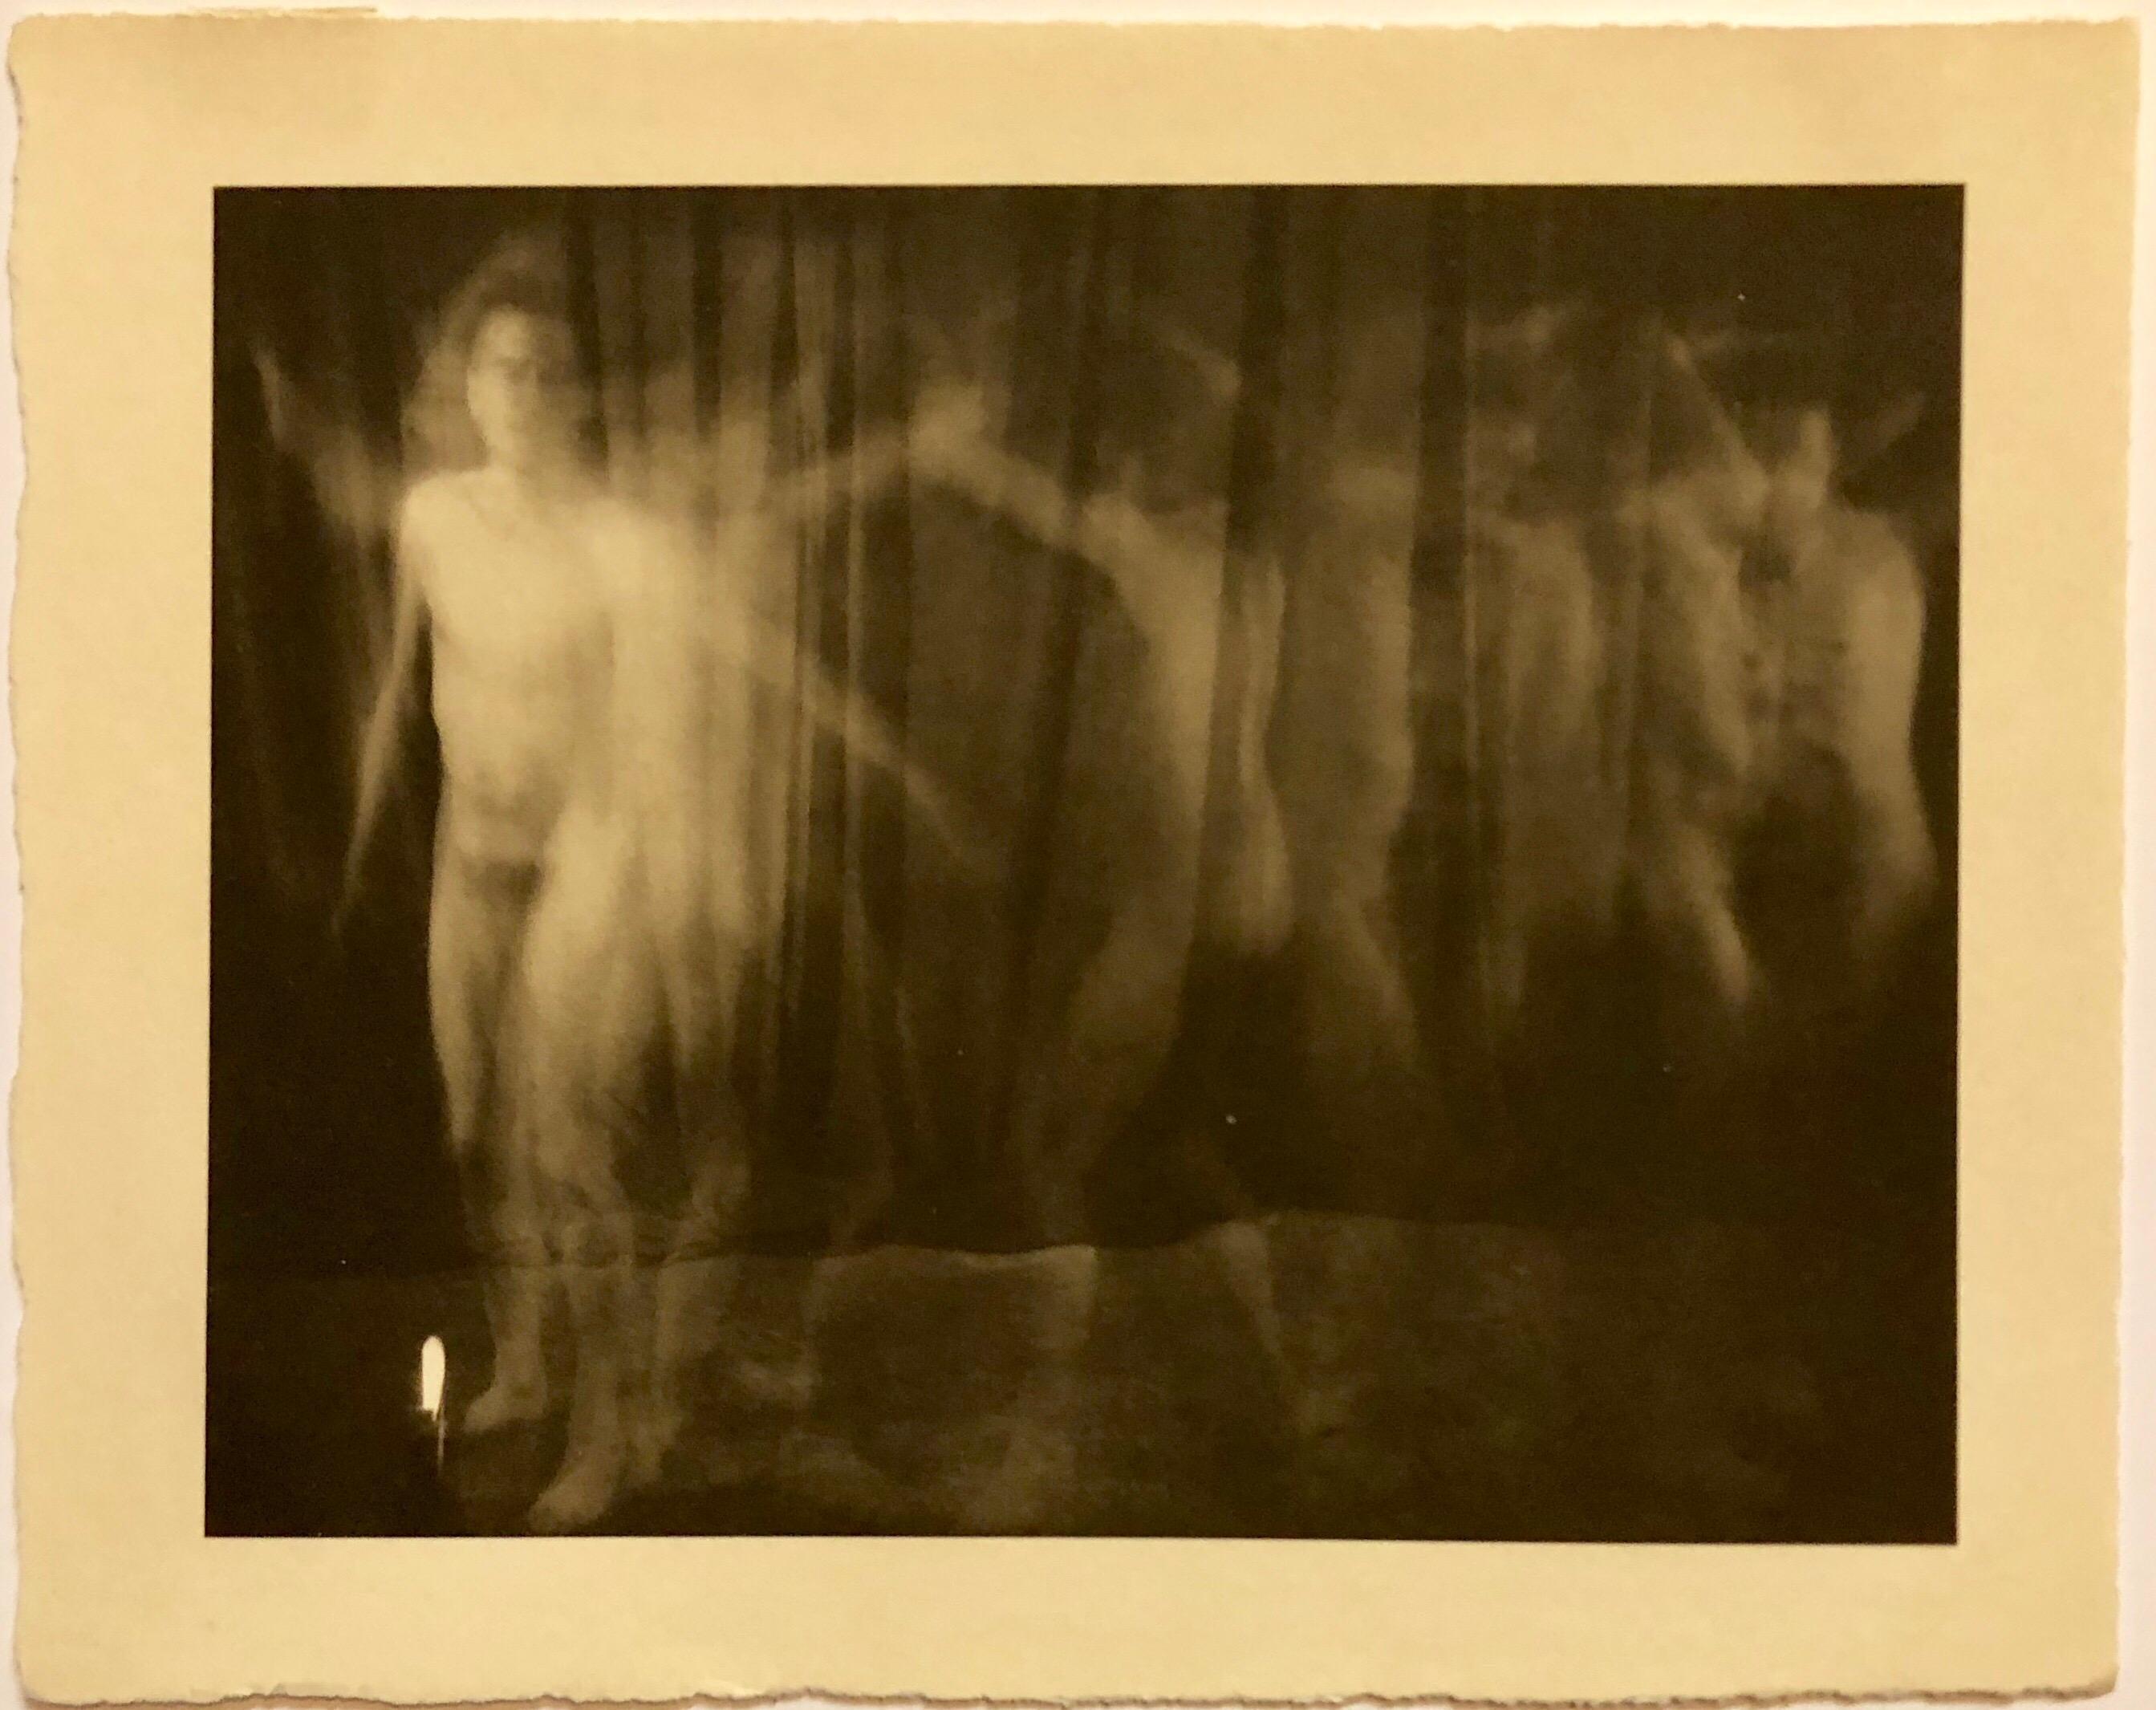 Vintage Photograph Male Nude Platinum Print Photo 'Ring Around the Rosie'